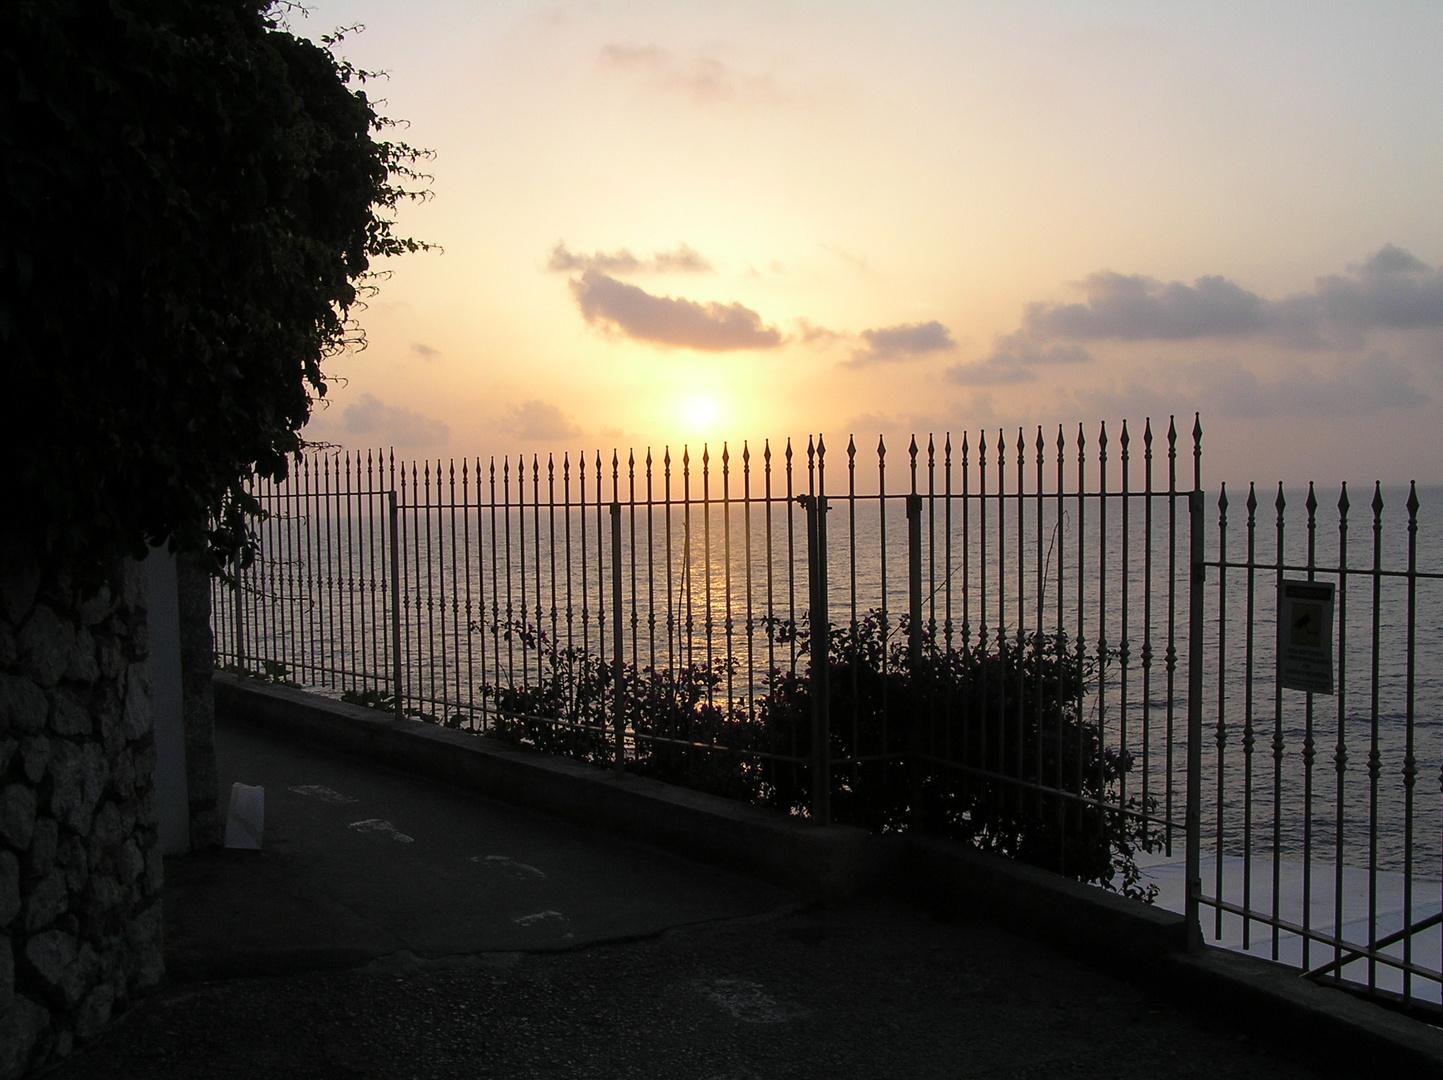 Sonnenuntergang auf der Insel Capri (1)